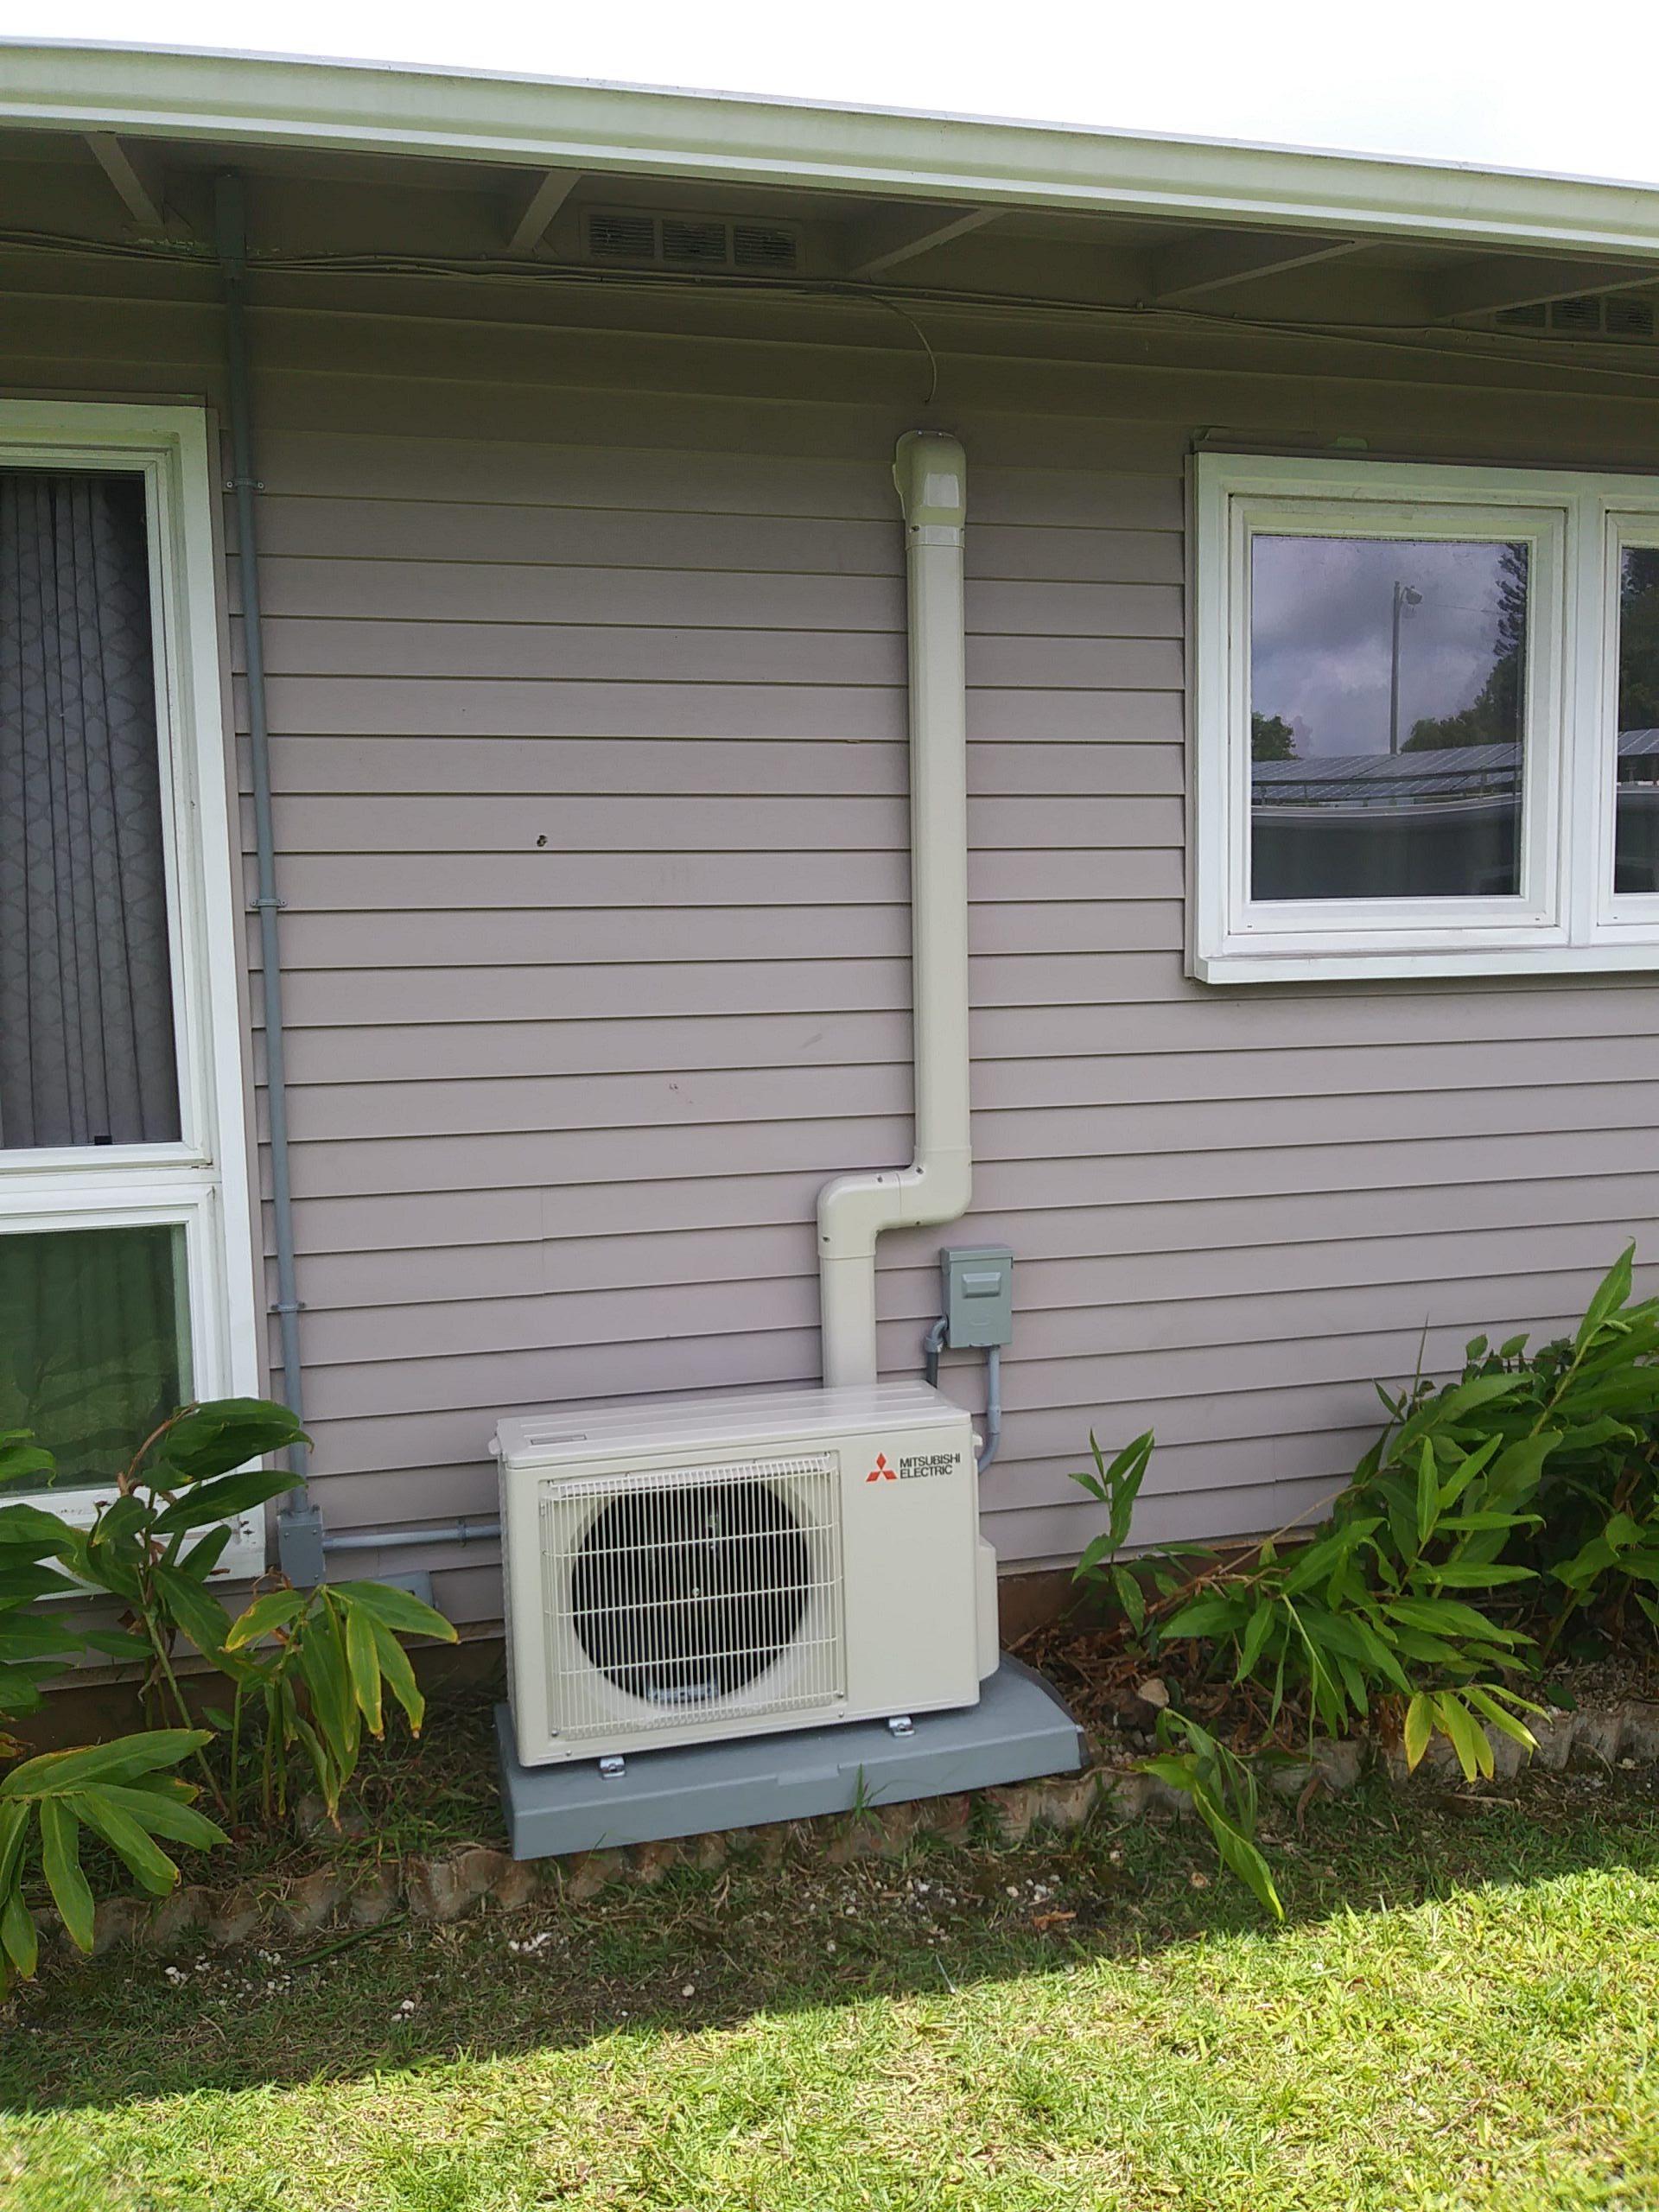 RevoluSun Smart Home Air Conditioning